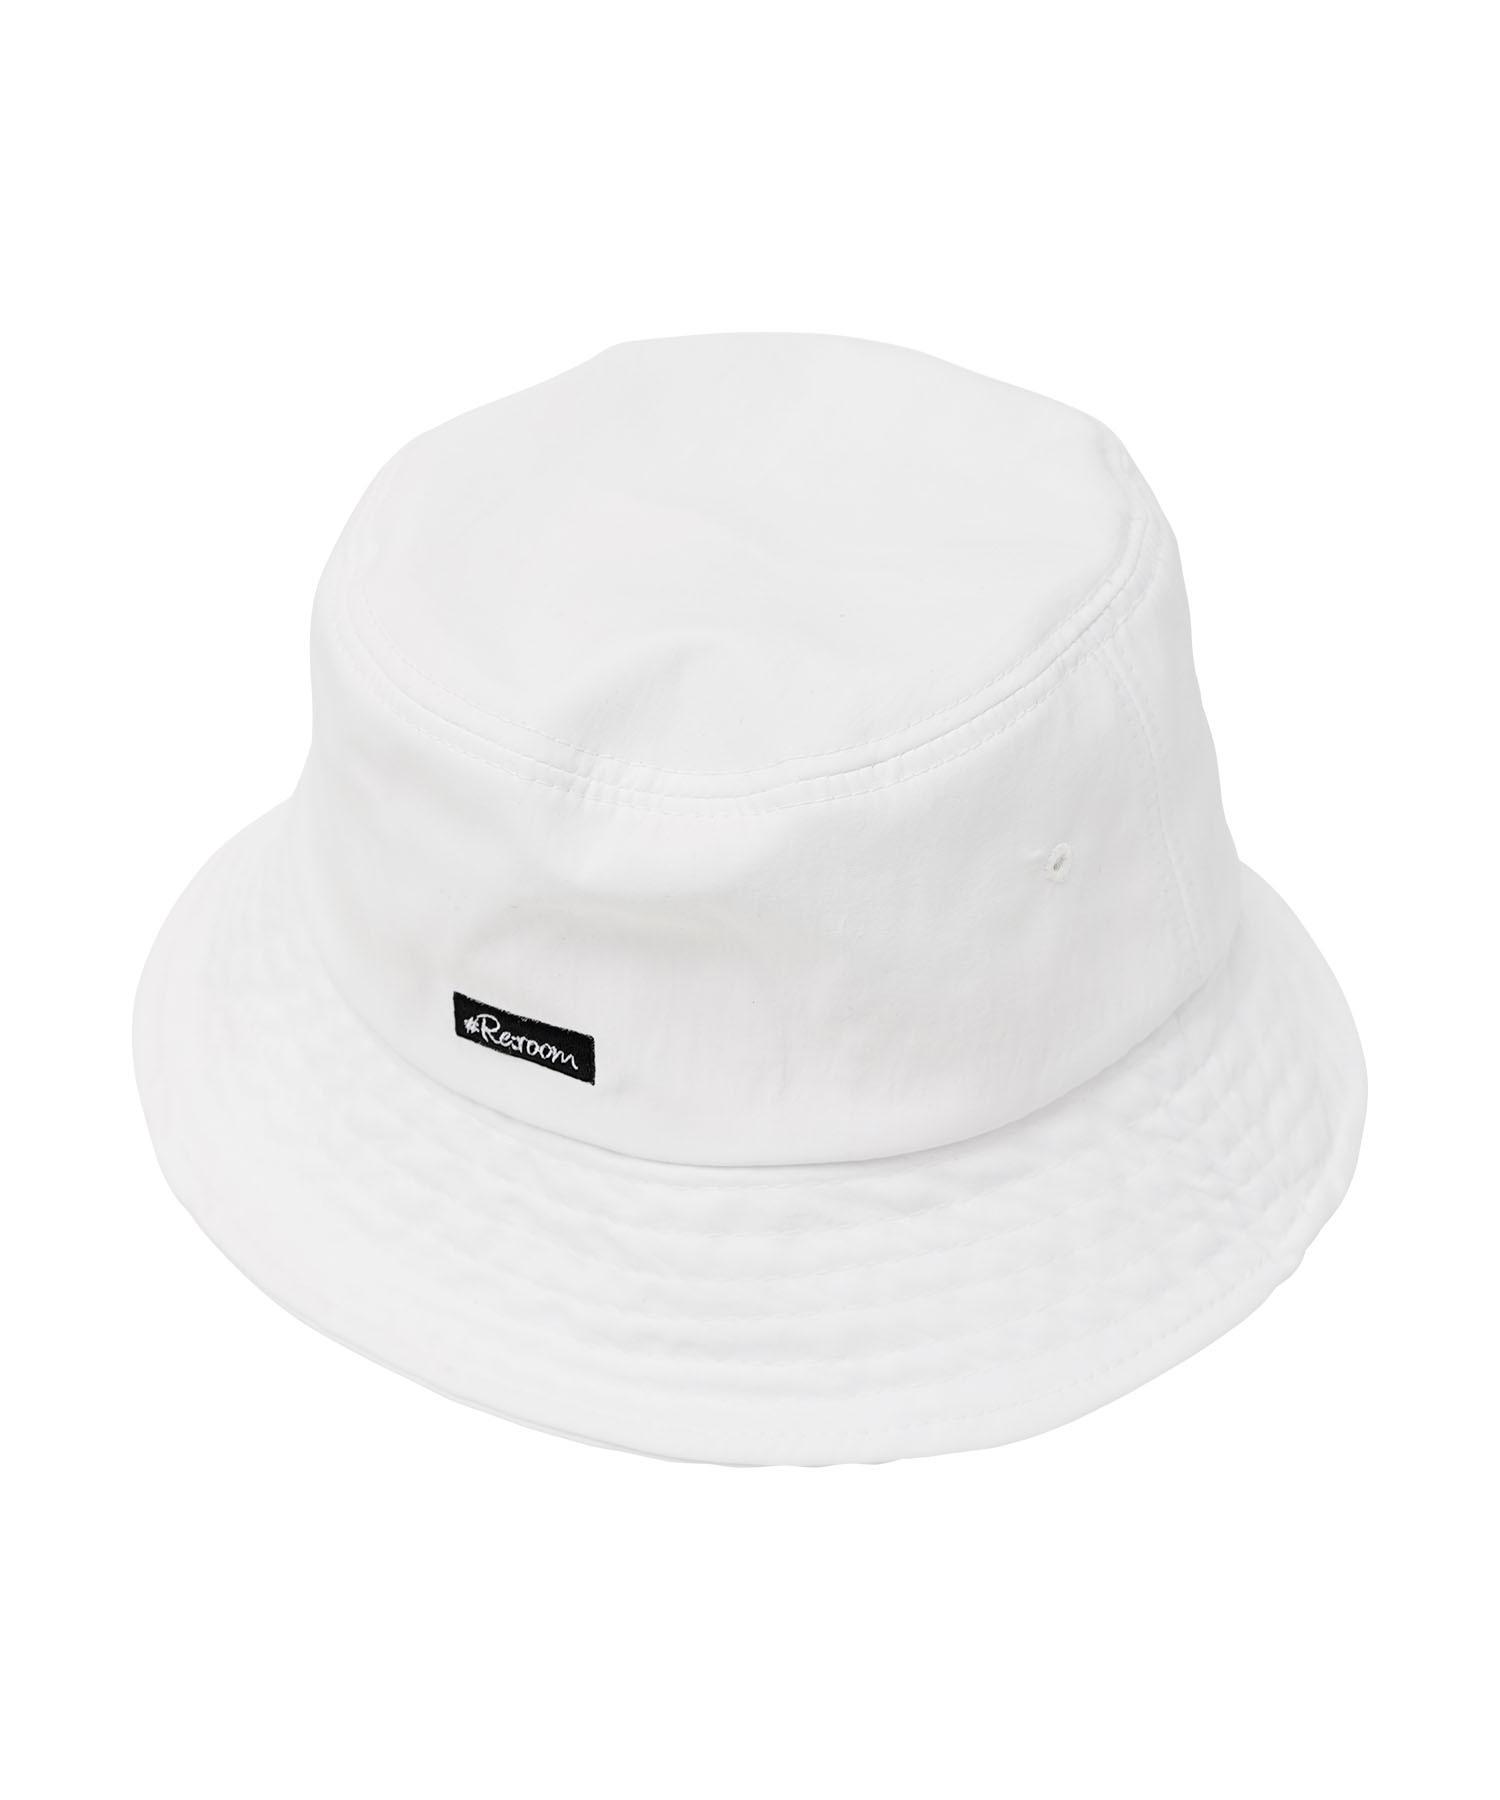 SMALL BOX LOGO BAGUETTE HAT[REH123]